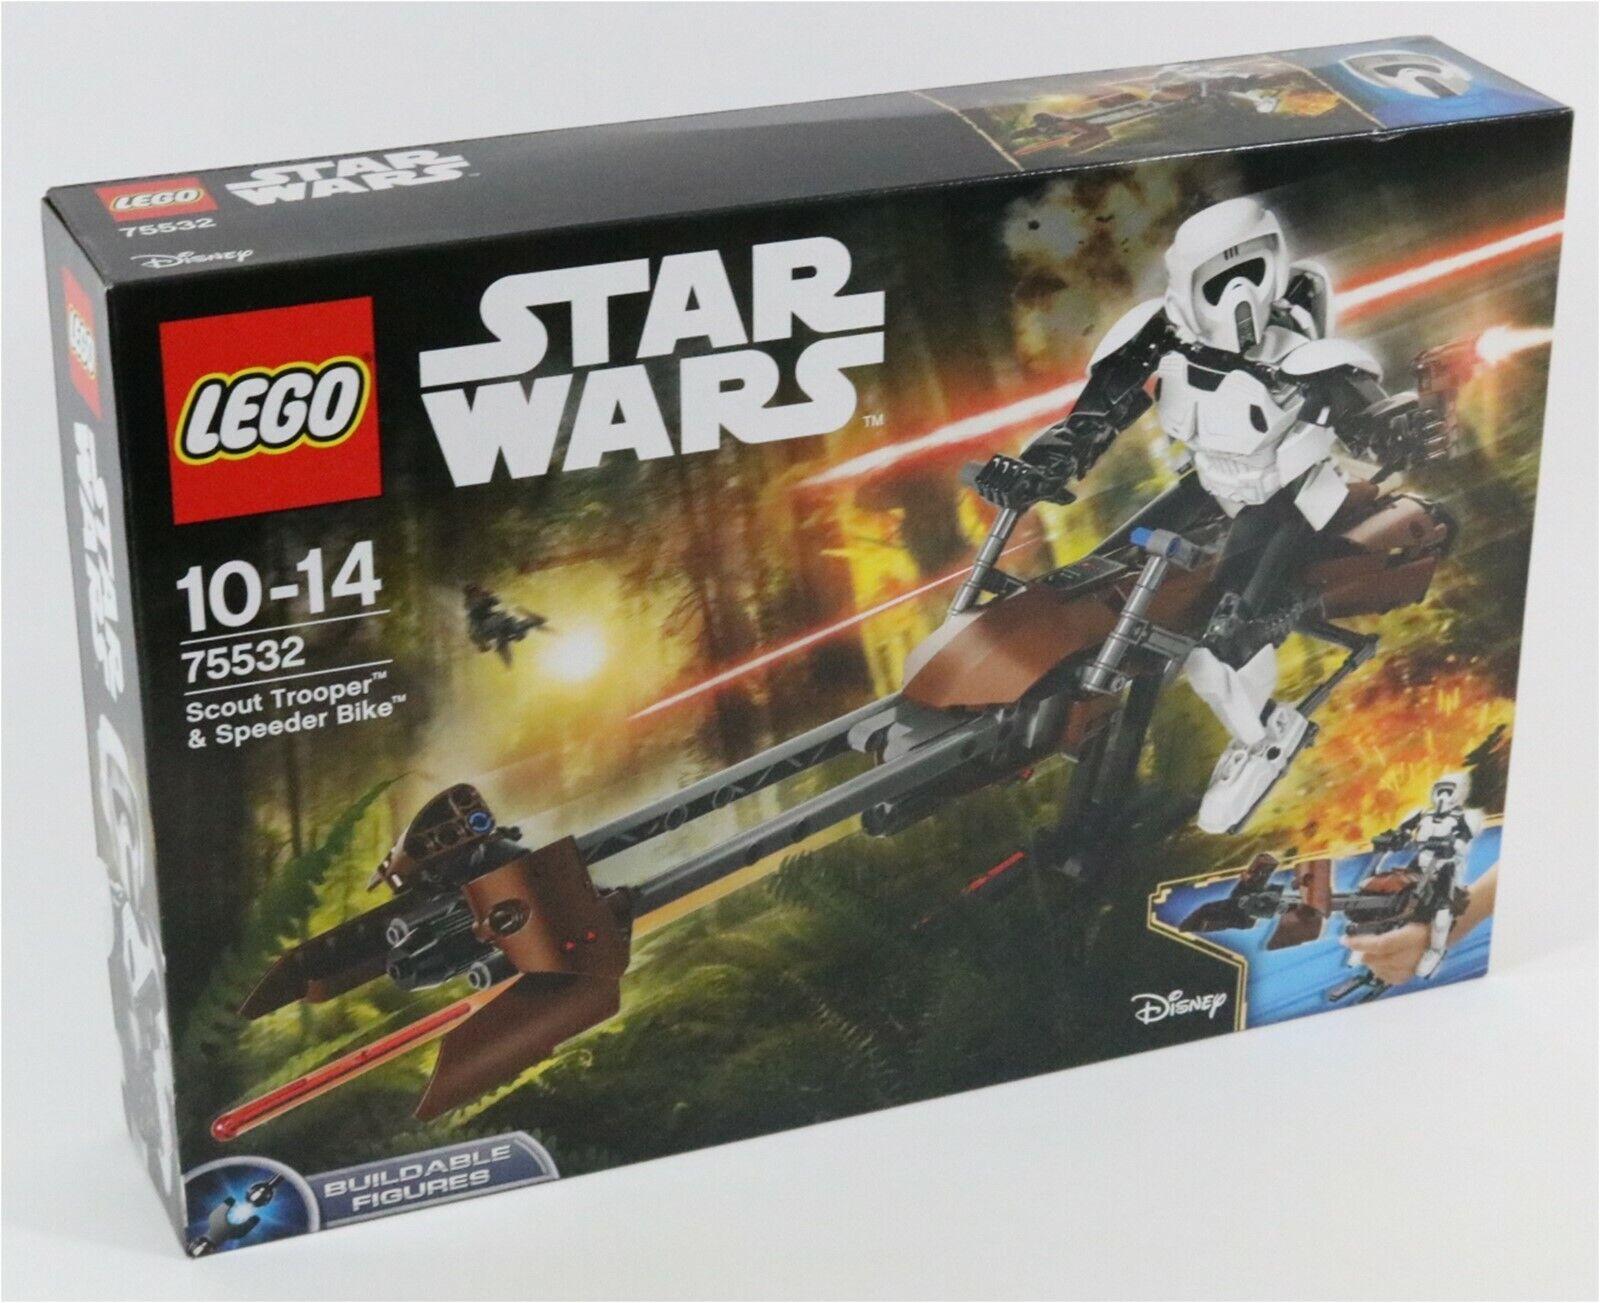 LEGO STAR WARS 75532 SCOUT TROOPER BUILDABLE FIGURE & SPEEDER Fahrrad SET - BNIB